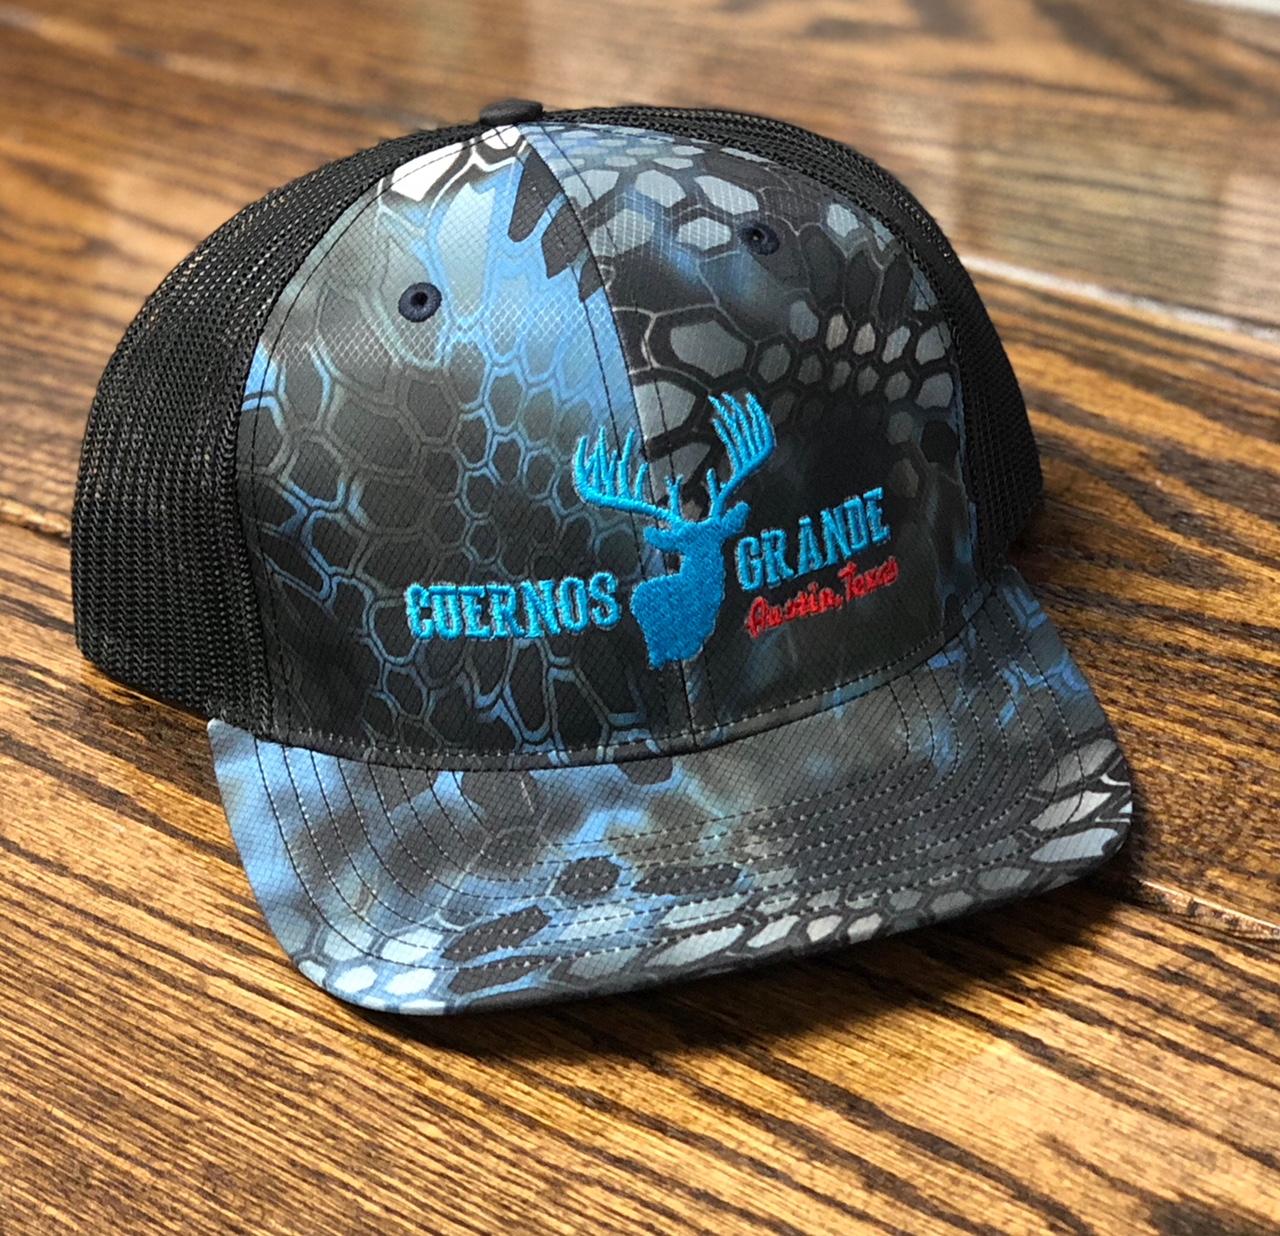 Cuernos Grande Websites- Austin, TX a division of www